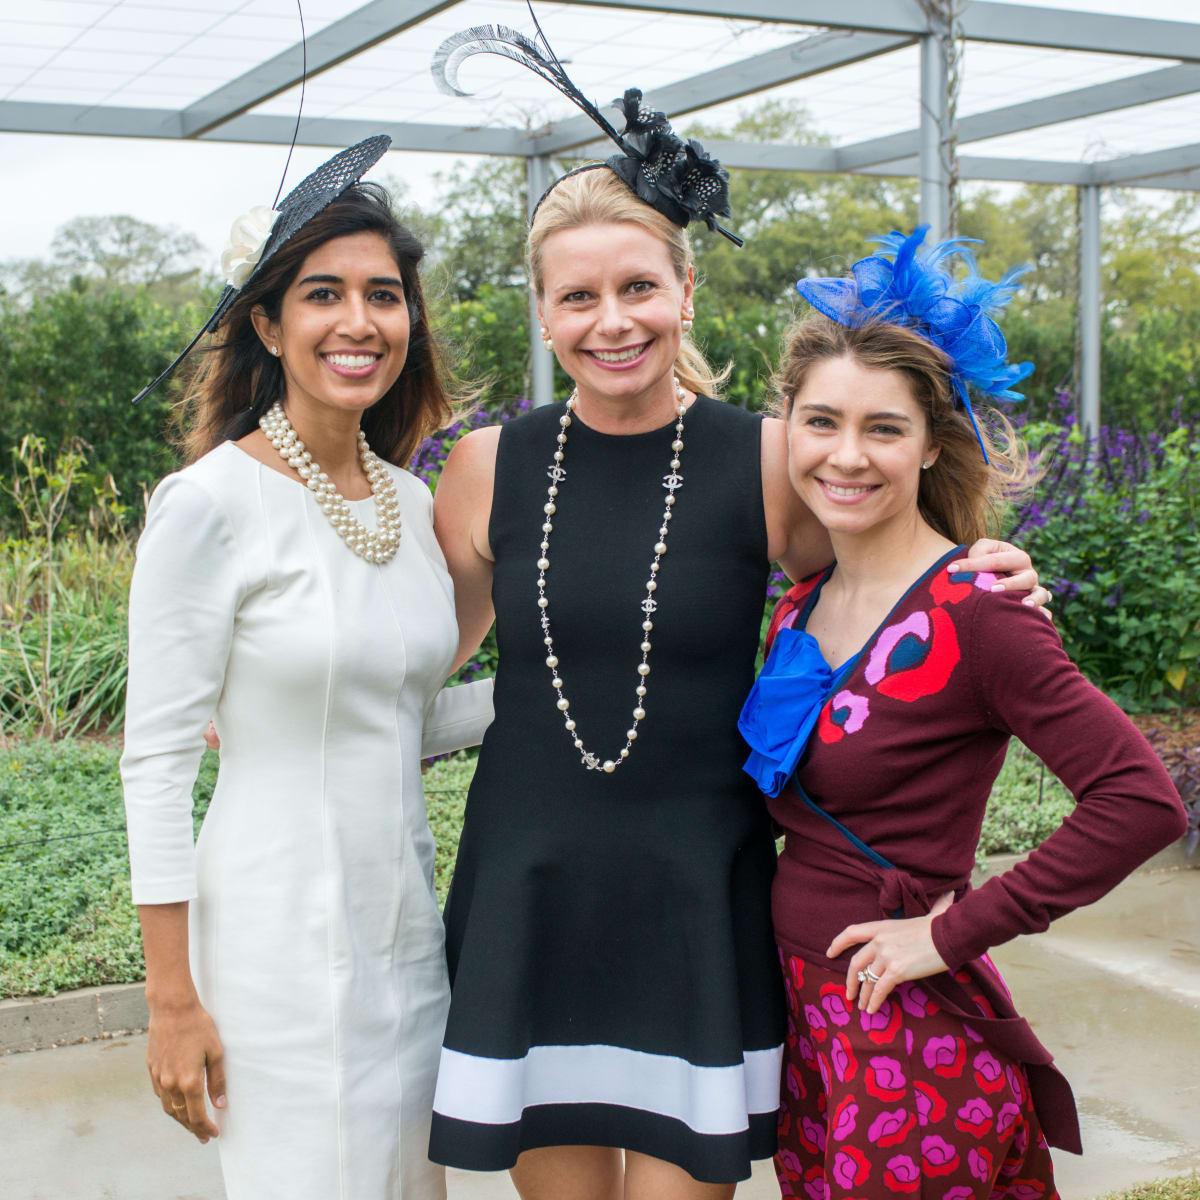 Hats in the Park, March 2016, Divya Brown, Valerie Dieterich, Rachel Volz